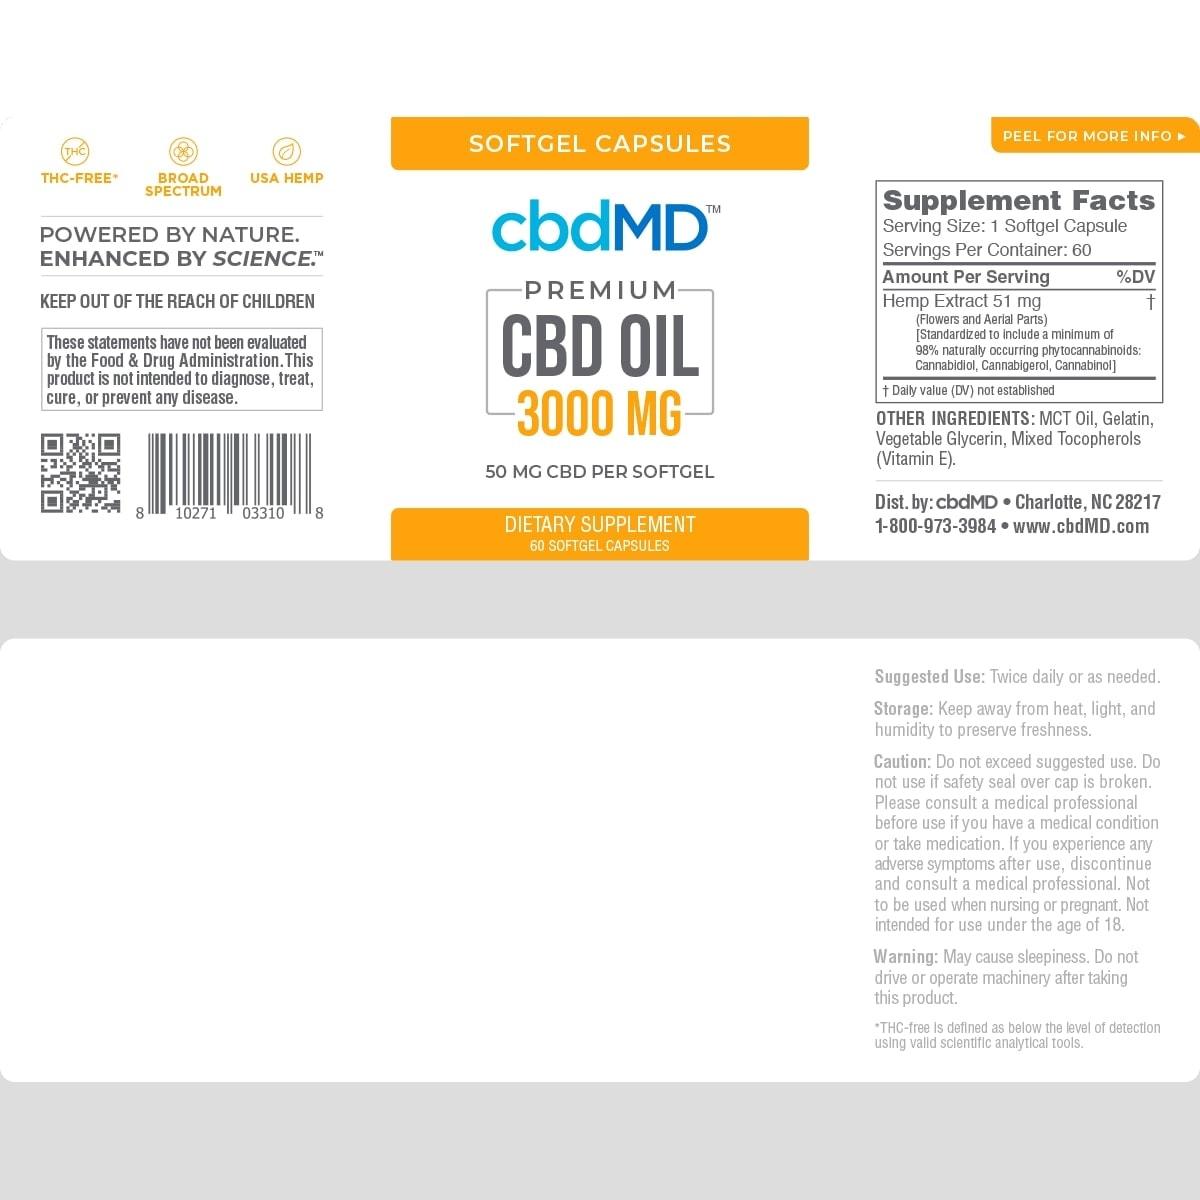 cbdMD, CBD Oil Softgel Capsules, Broad Spectrum THC-Free, 60-Count, 3000mg of CBD2